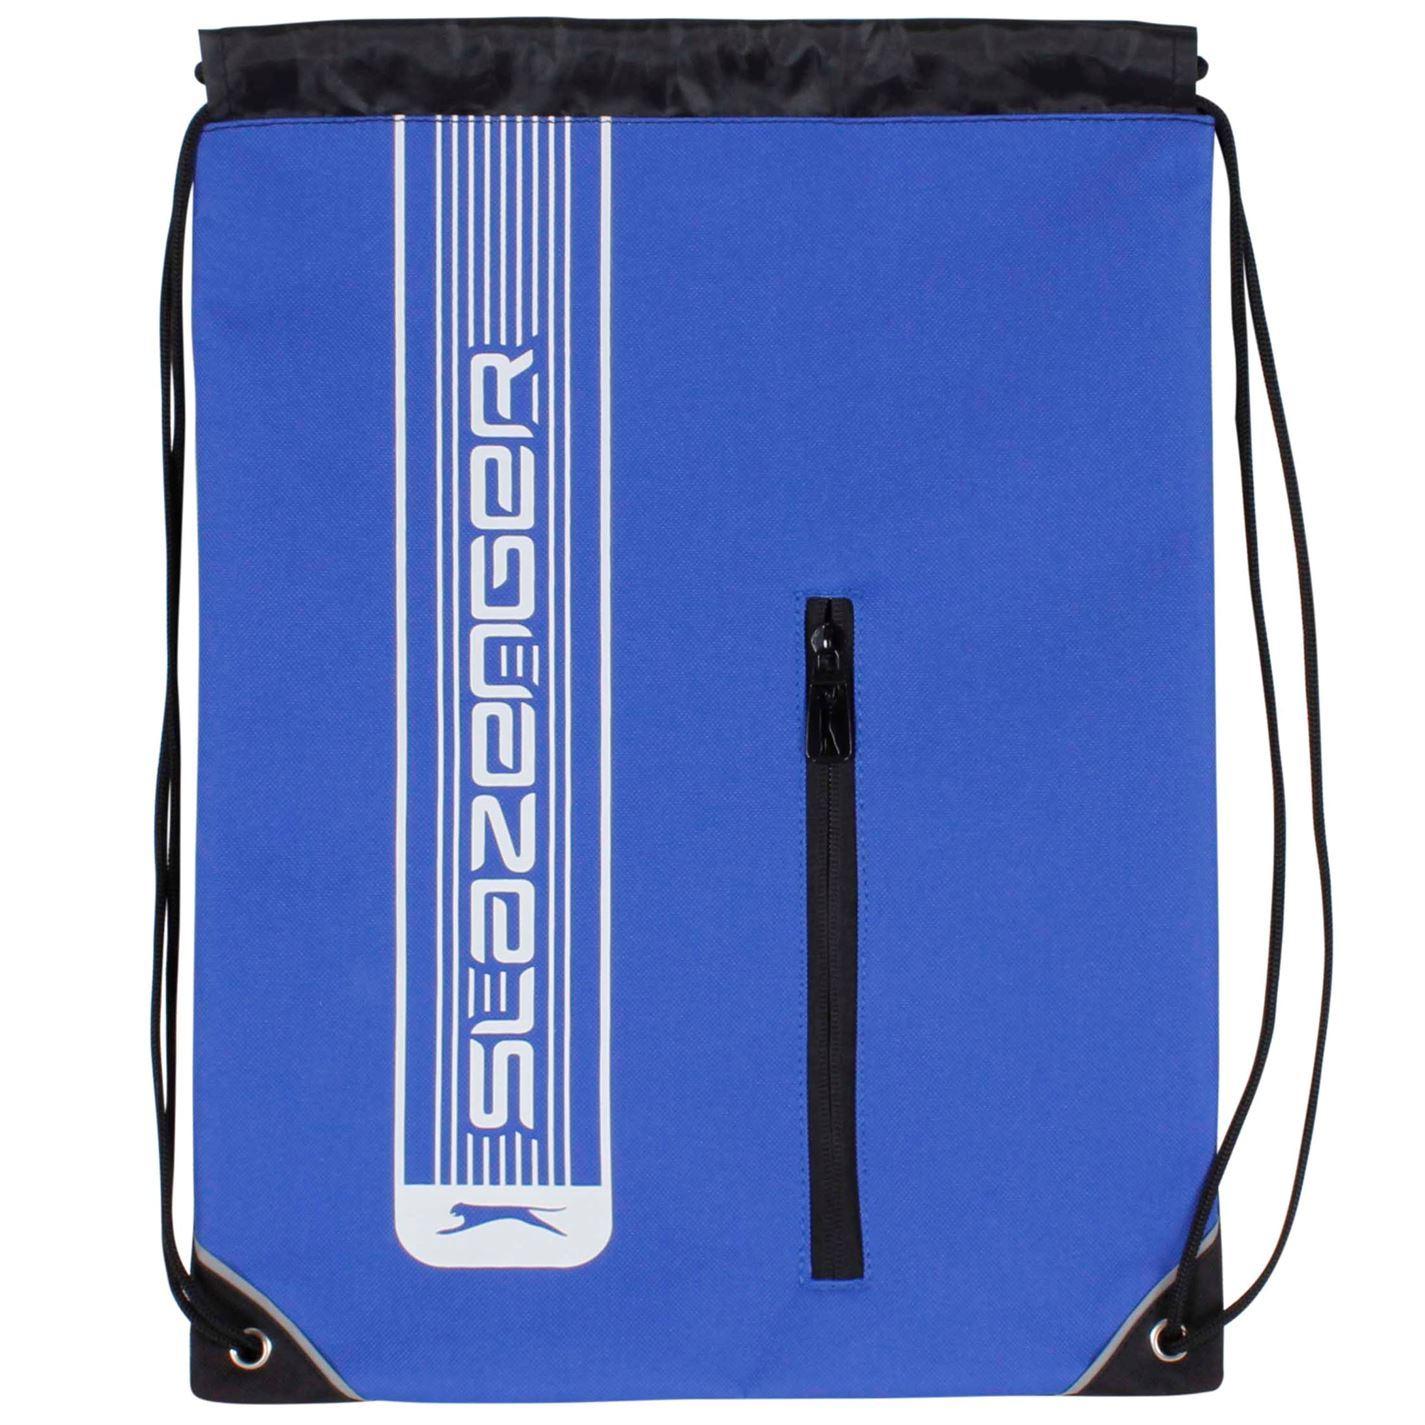 Slazenger Drawstring Gym Bag Royal School PE Sports Swimming Kit Sack